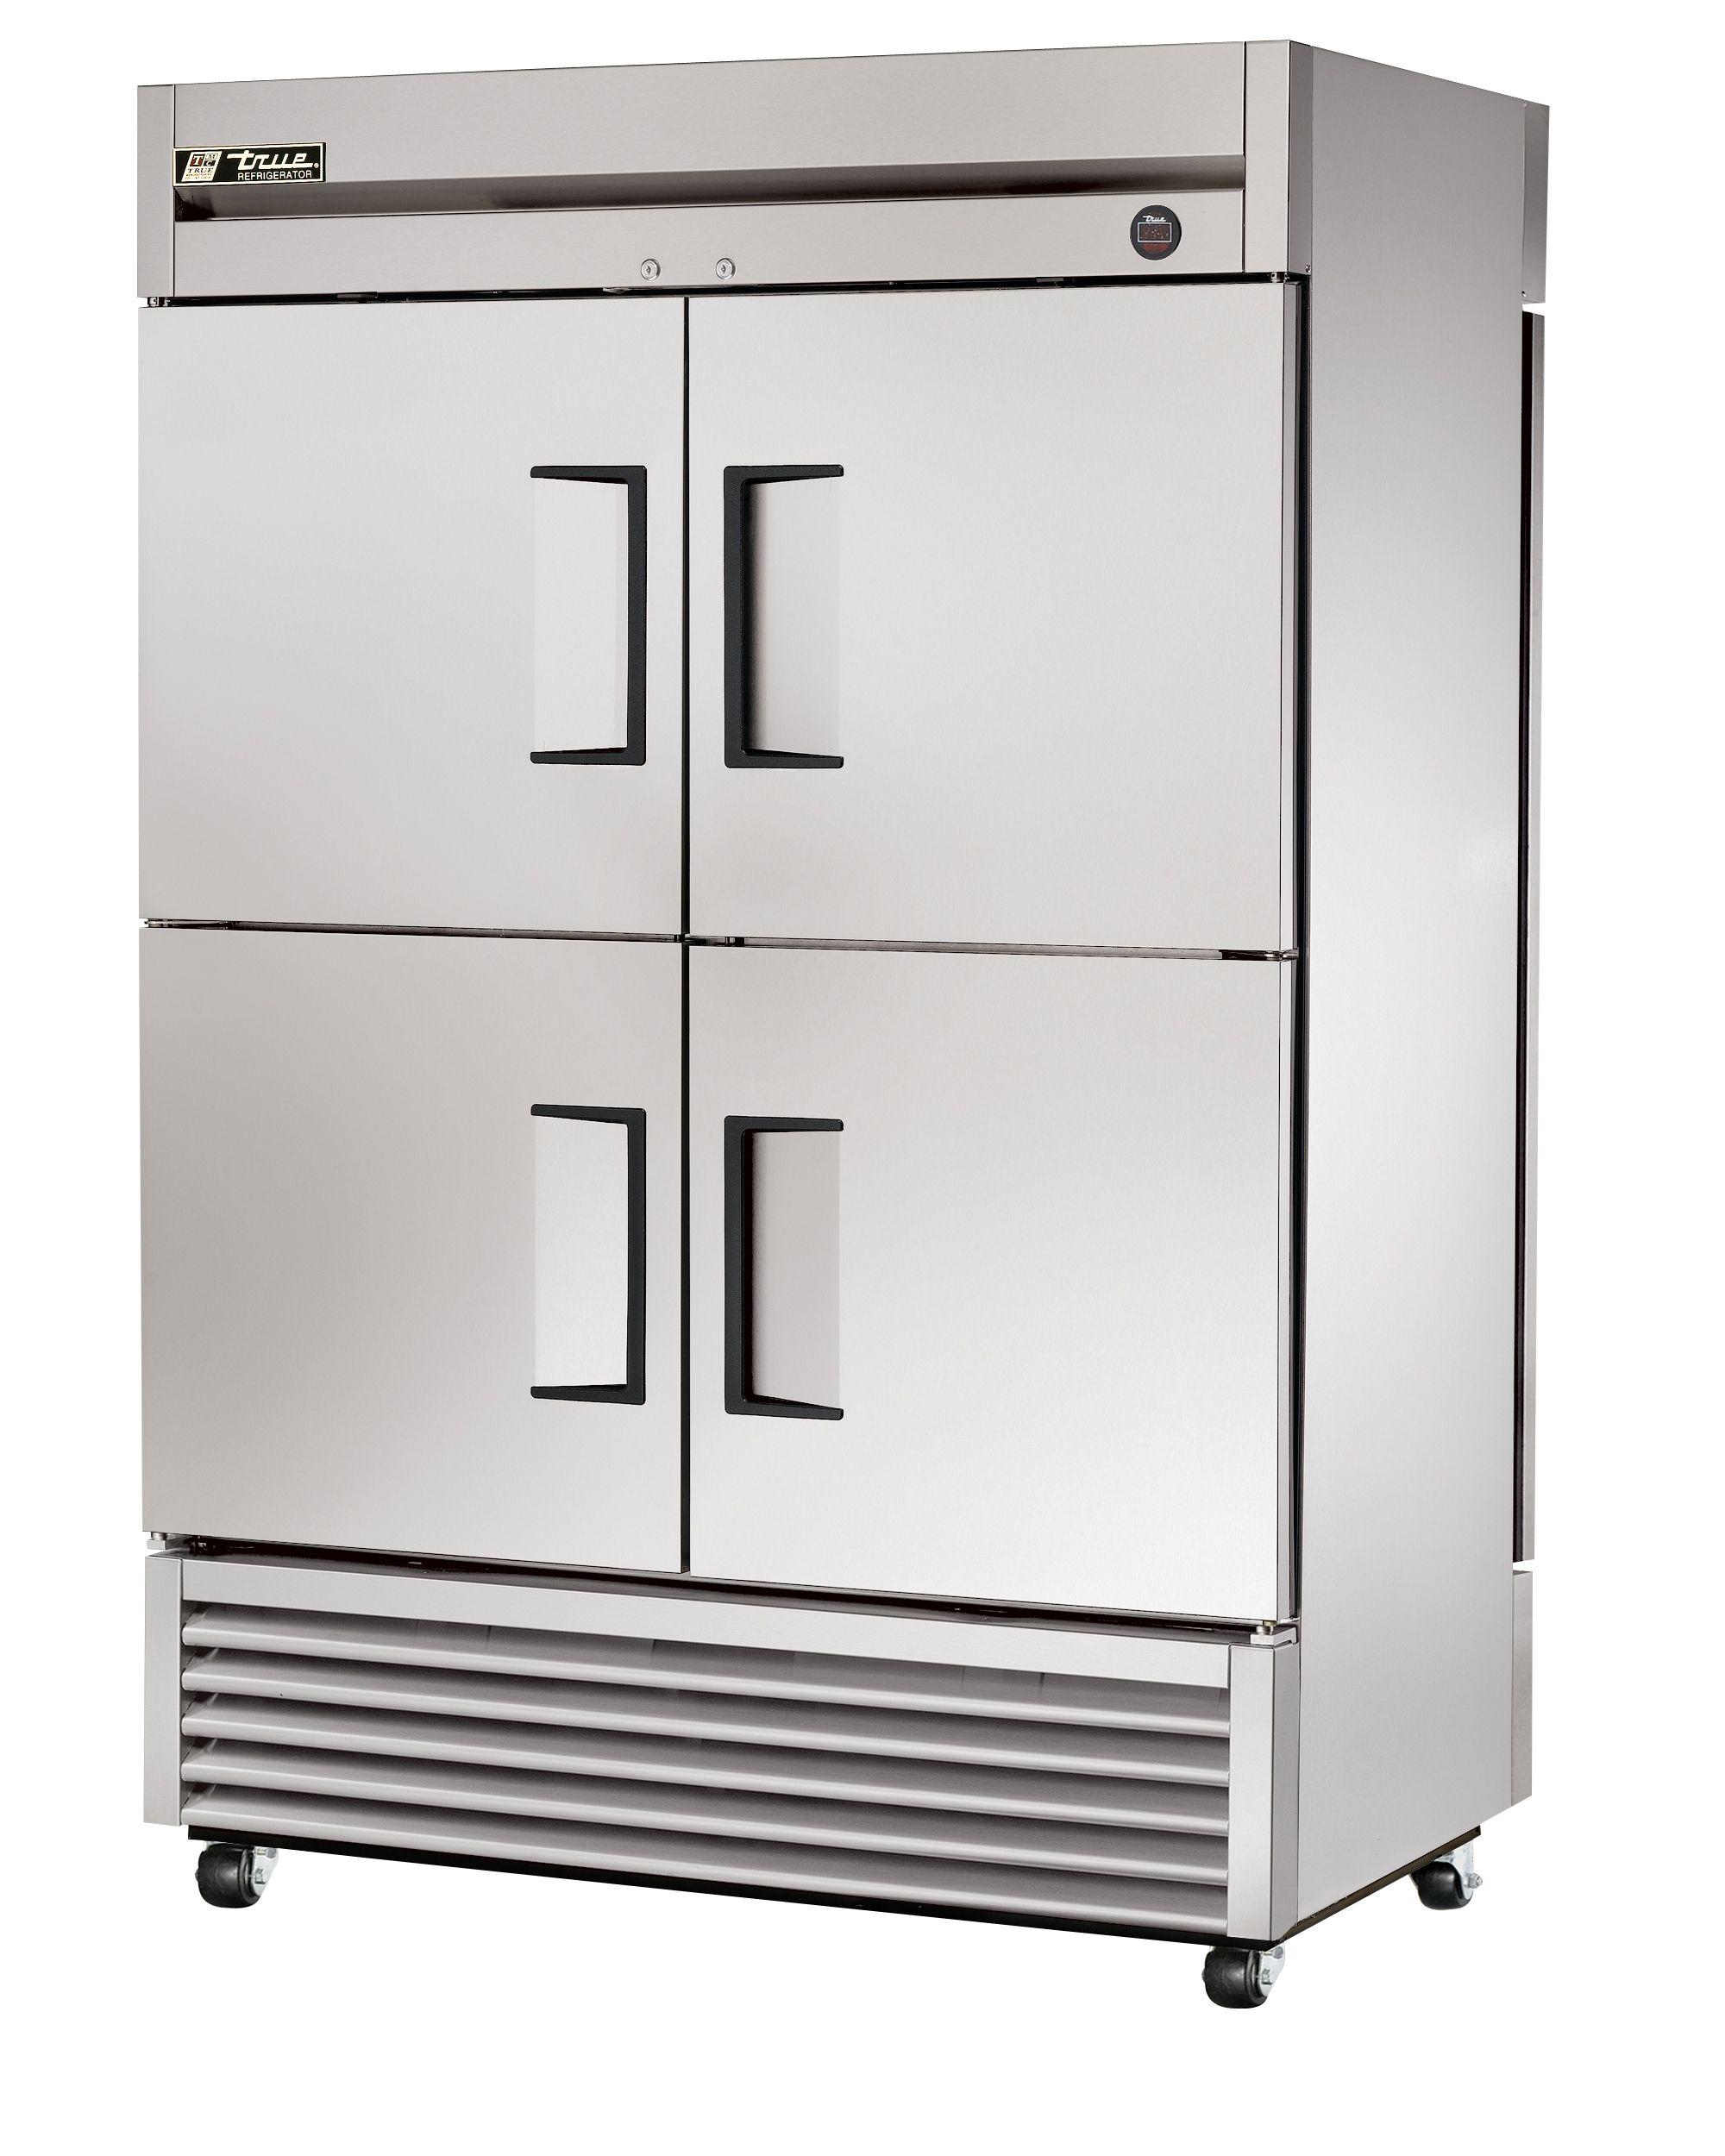 T494PT Solid doors, Stainless steel Locker